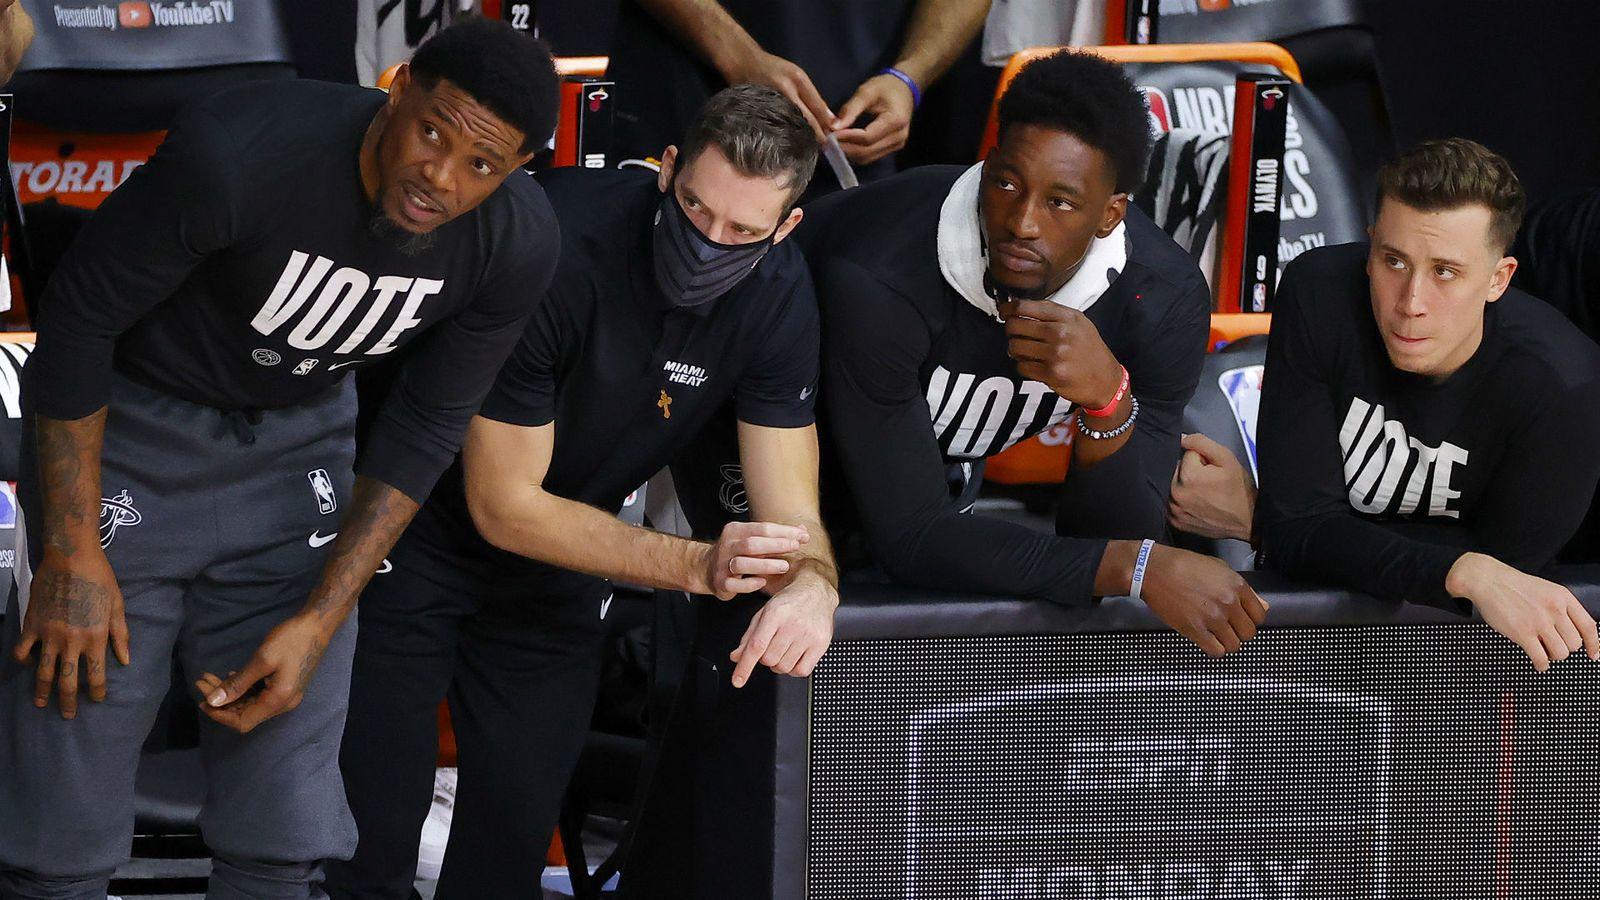 Bam Adebayo et Goran Dragic absents lors du match 3 des Finales NBA